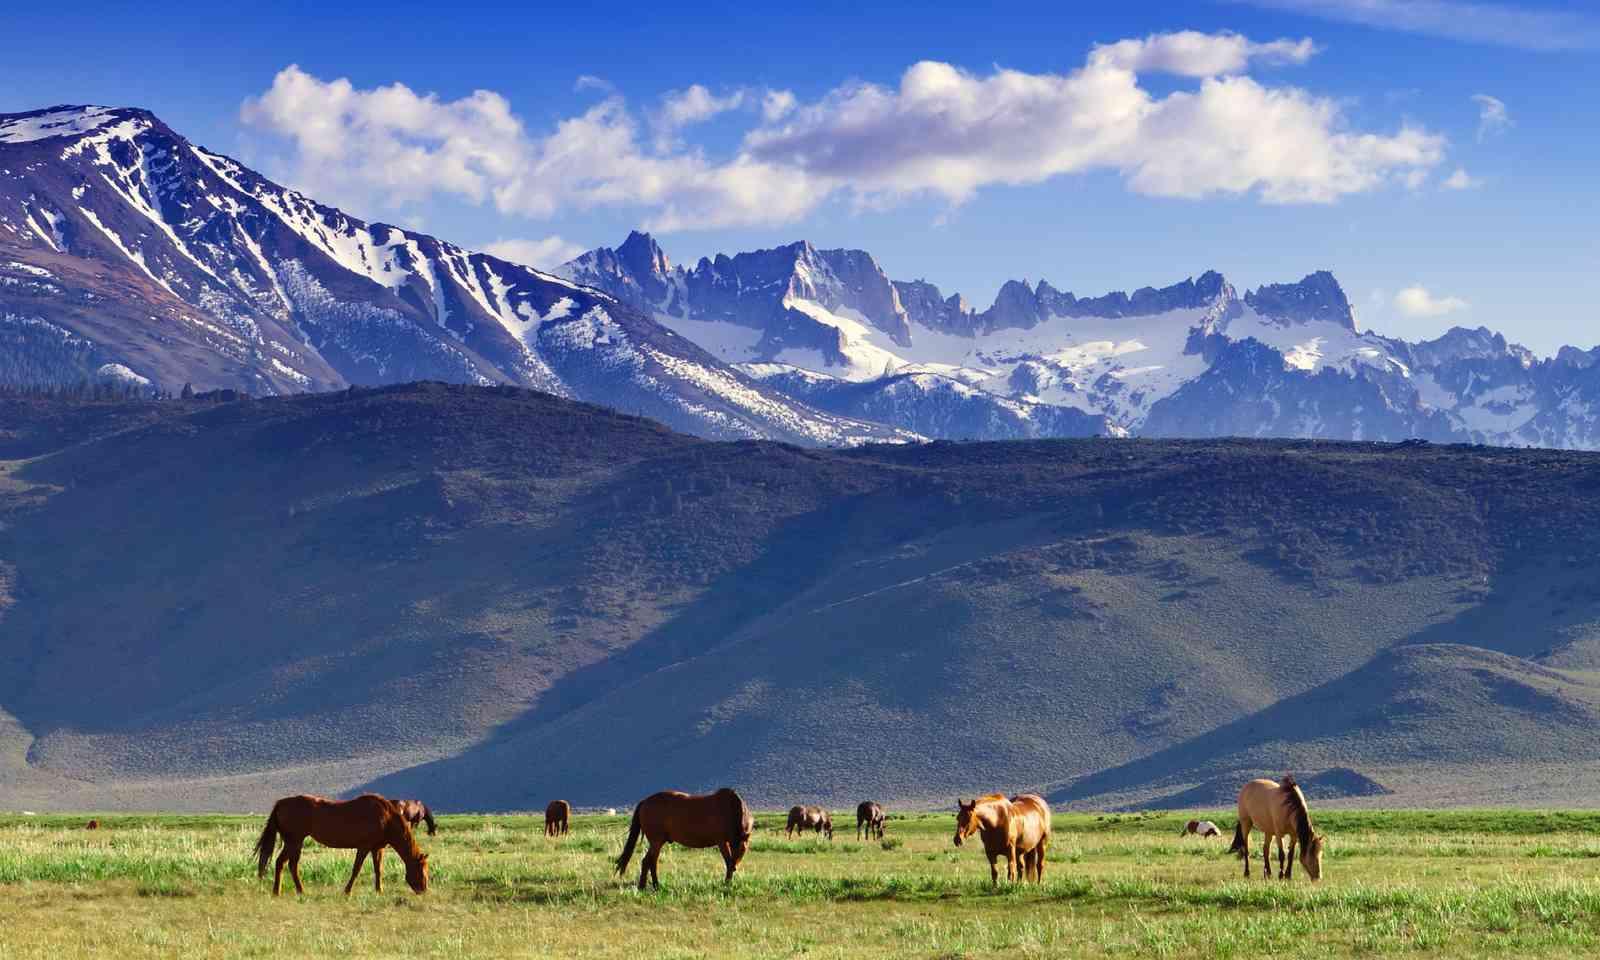 Wild horses near Bridgeport, California (Shutterstock.com)